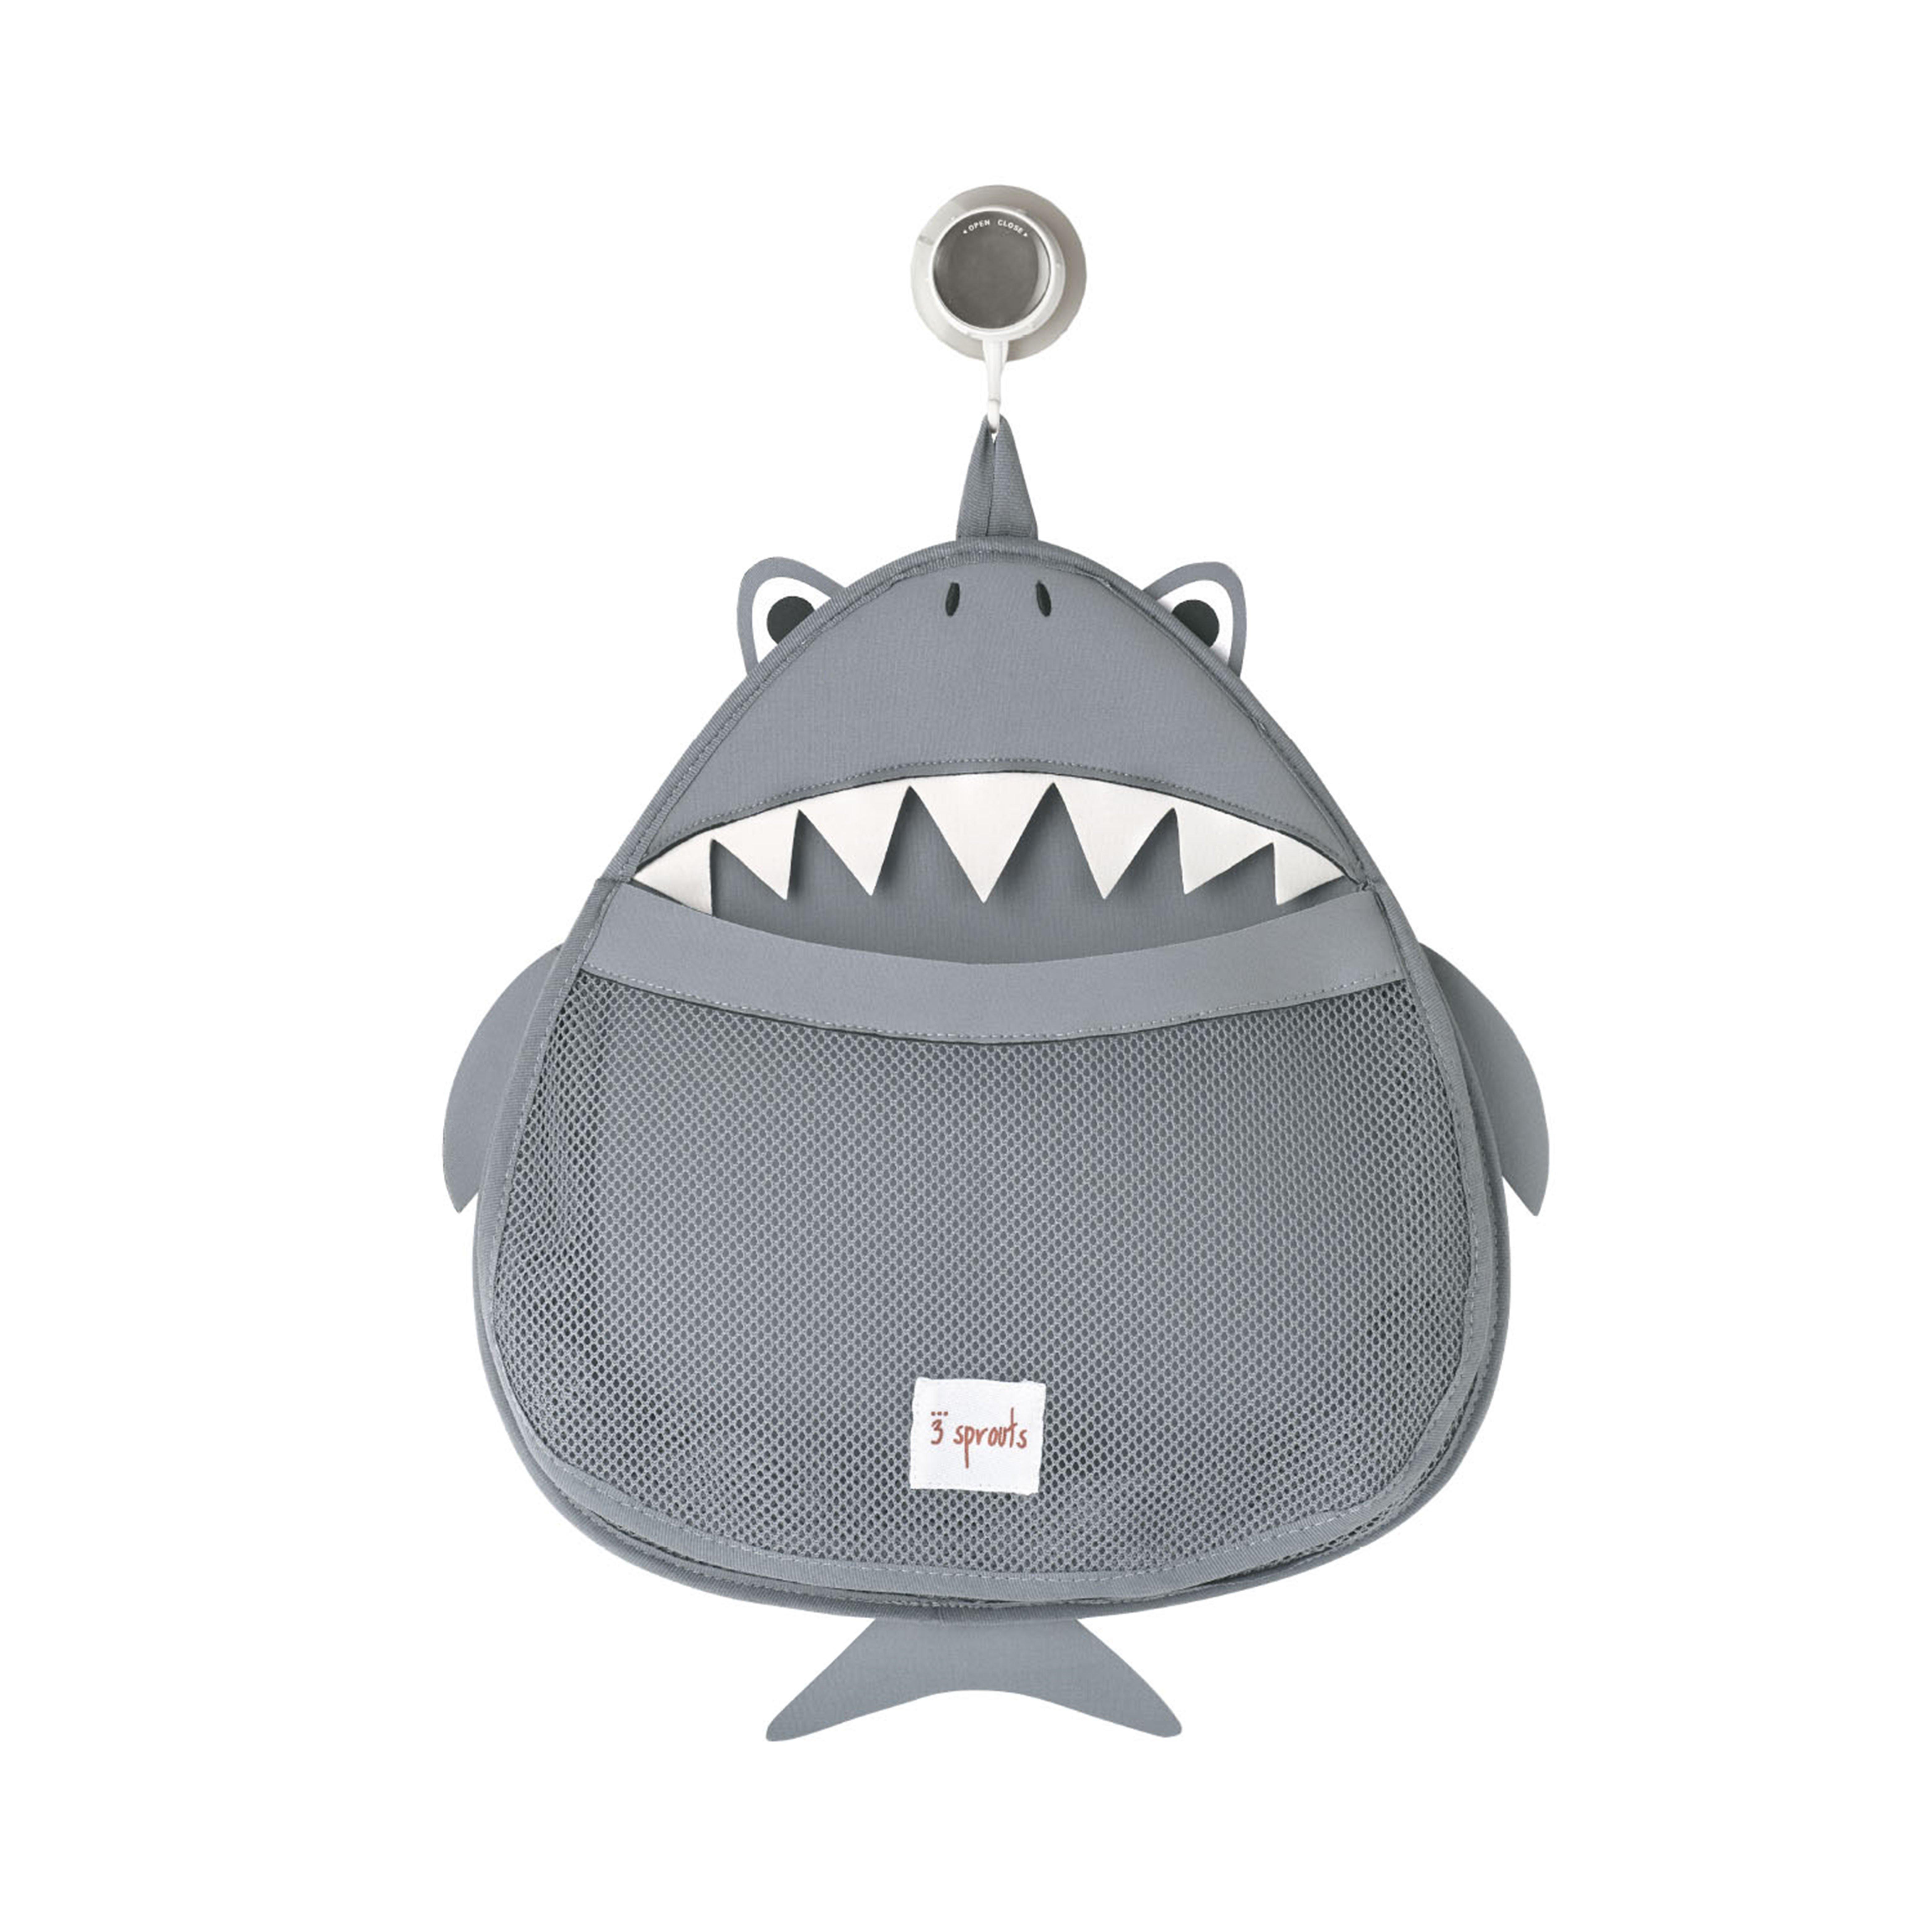 3 Sprouts - Bath Storage - Gray Shark